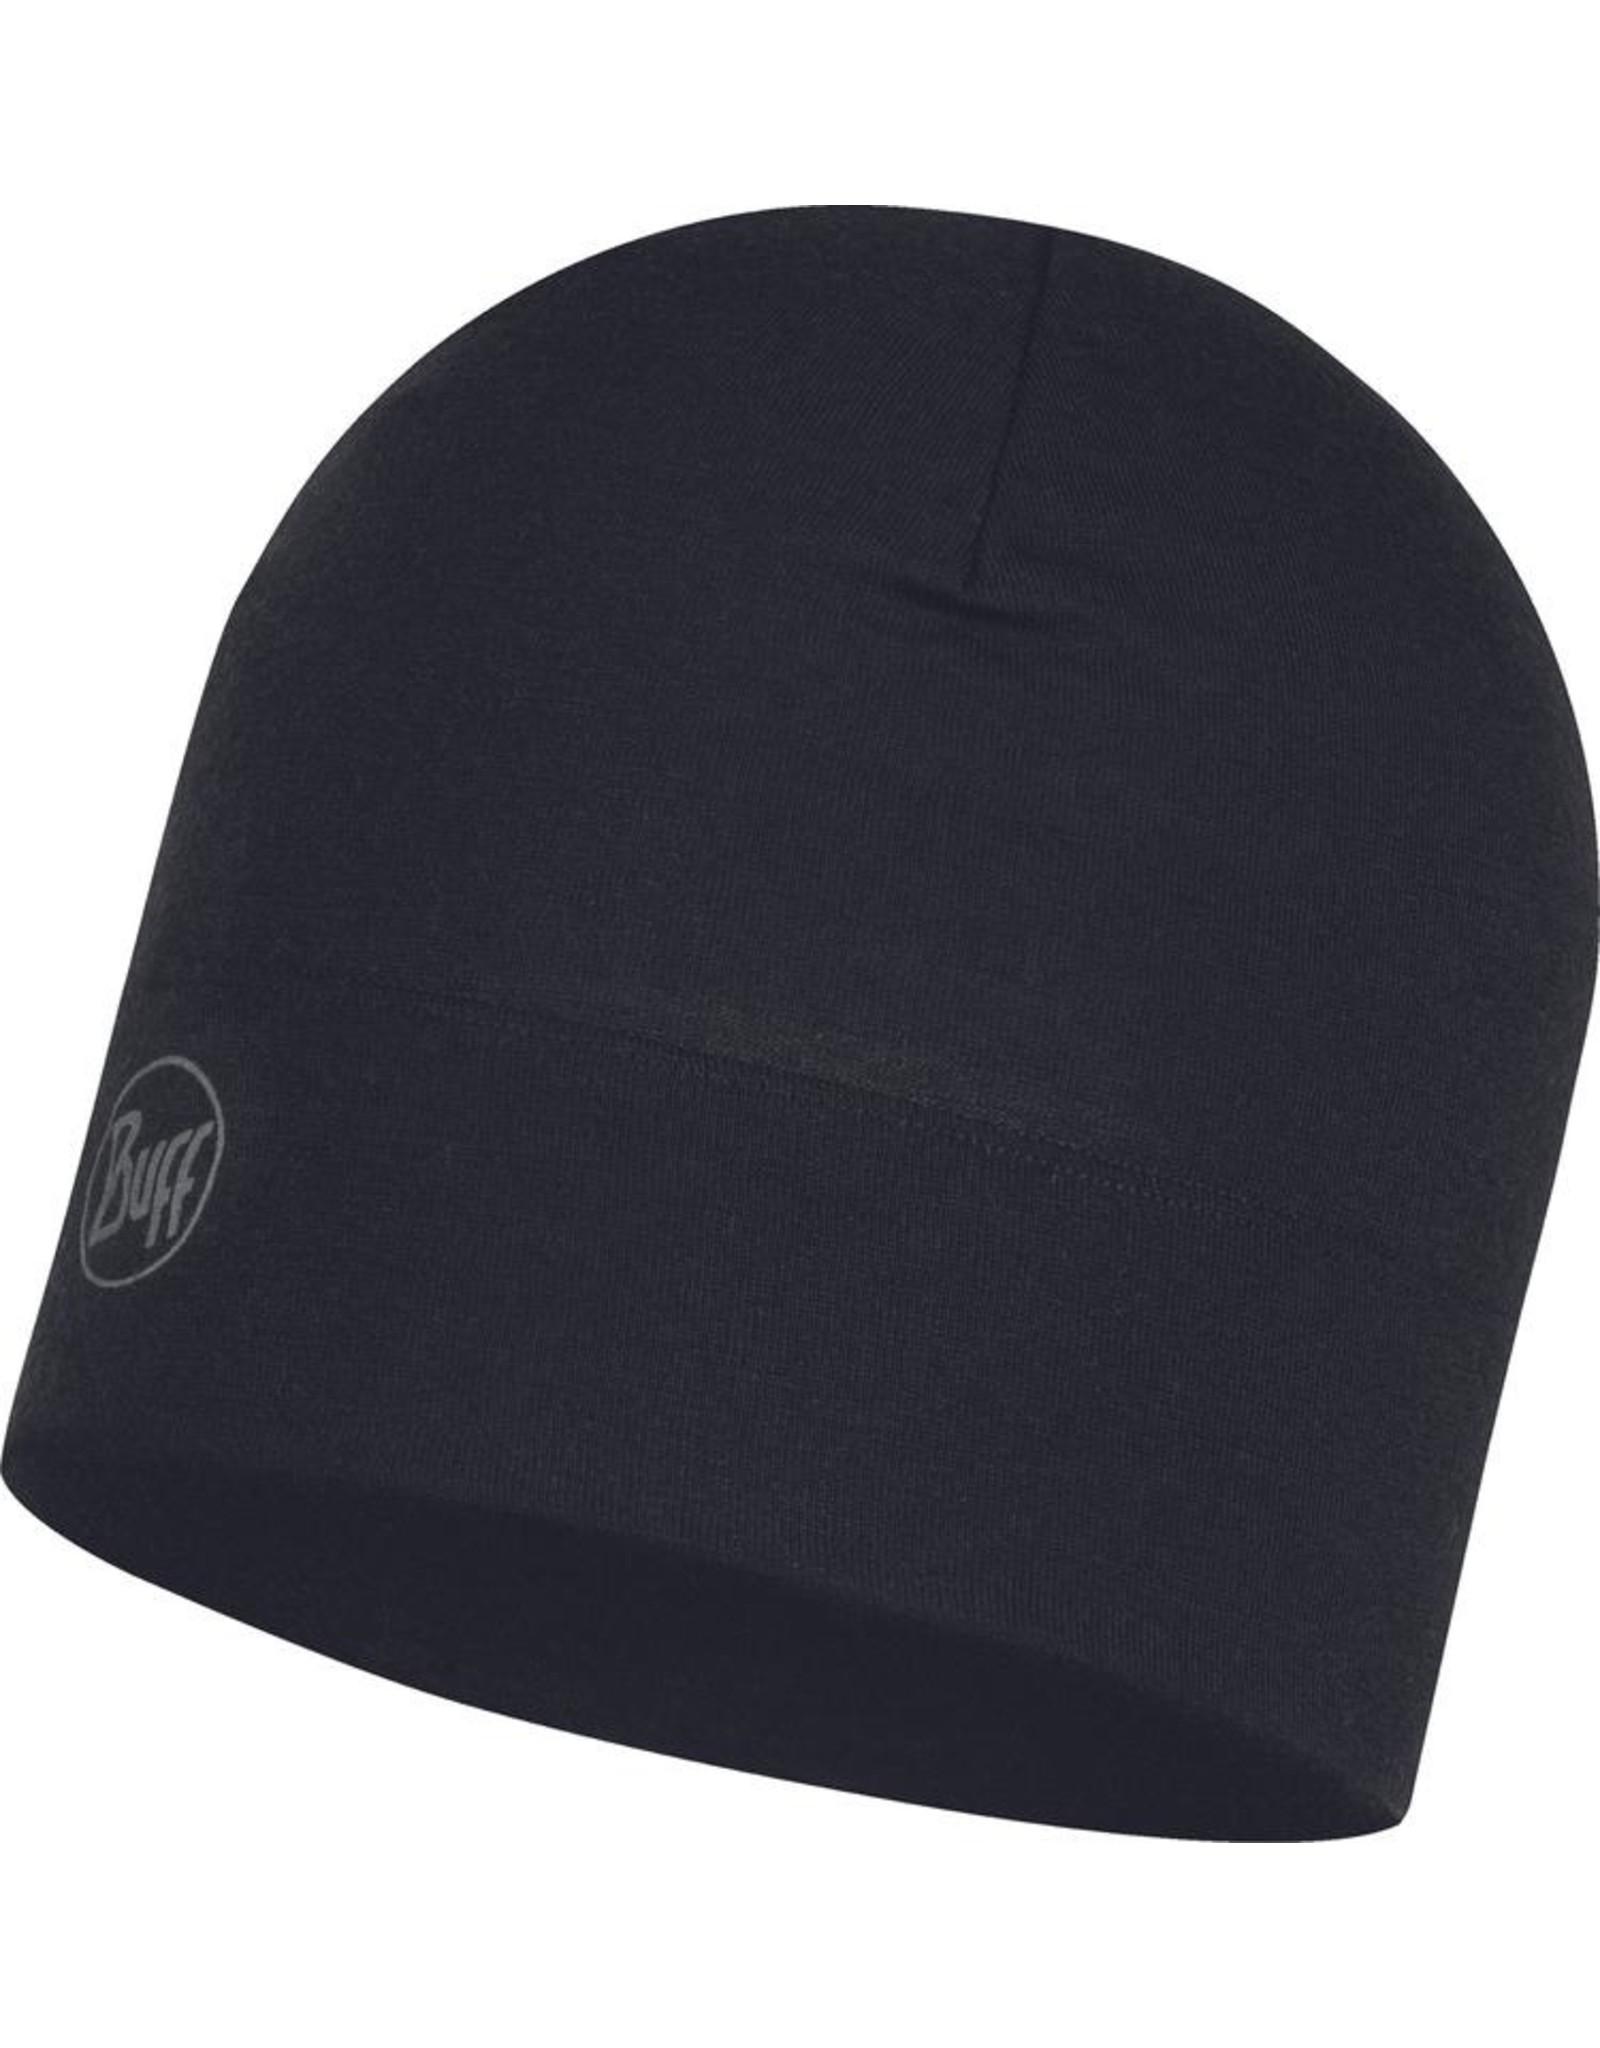 BUFF Merino MW Wool Headwear